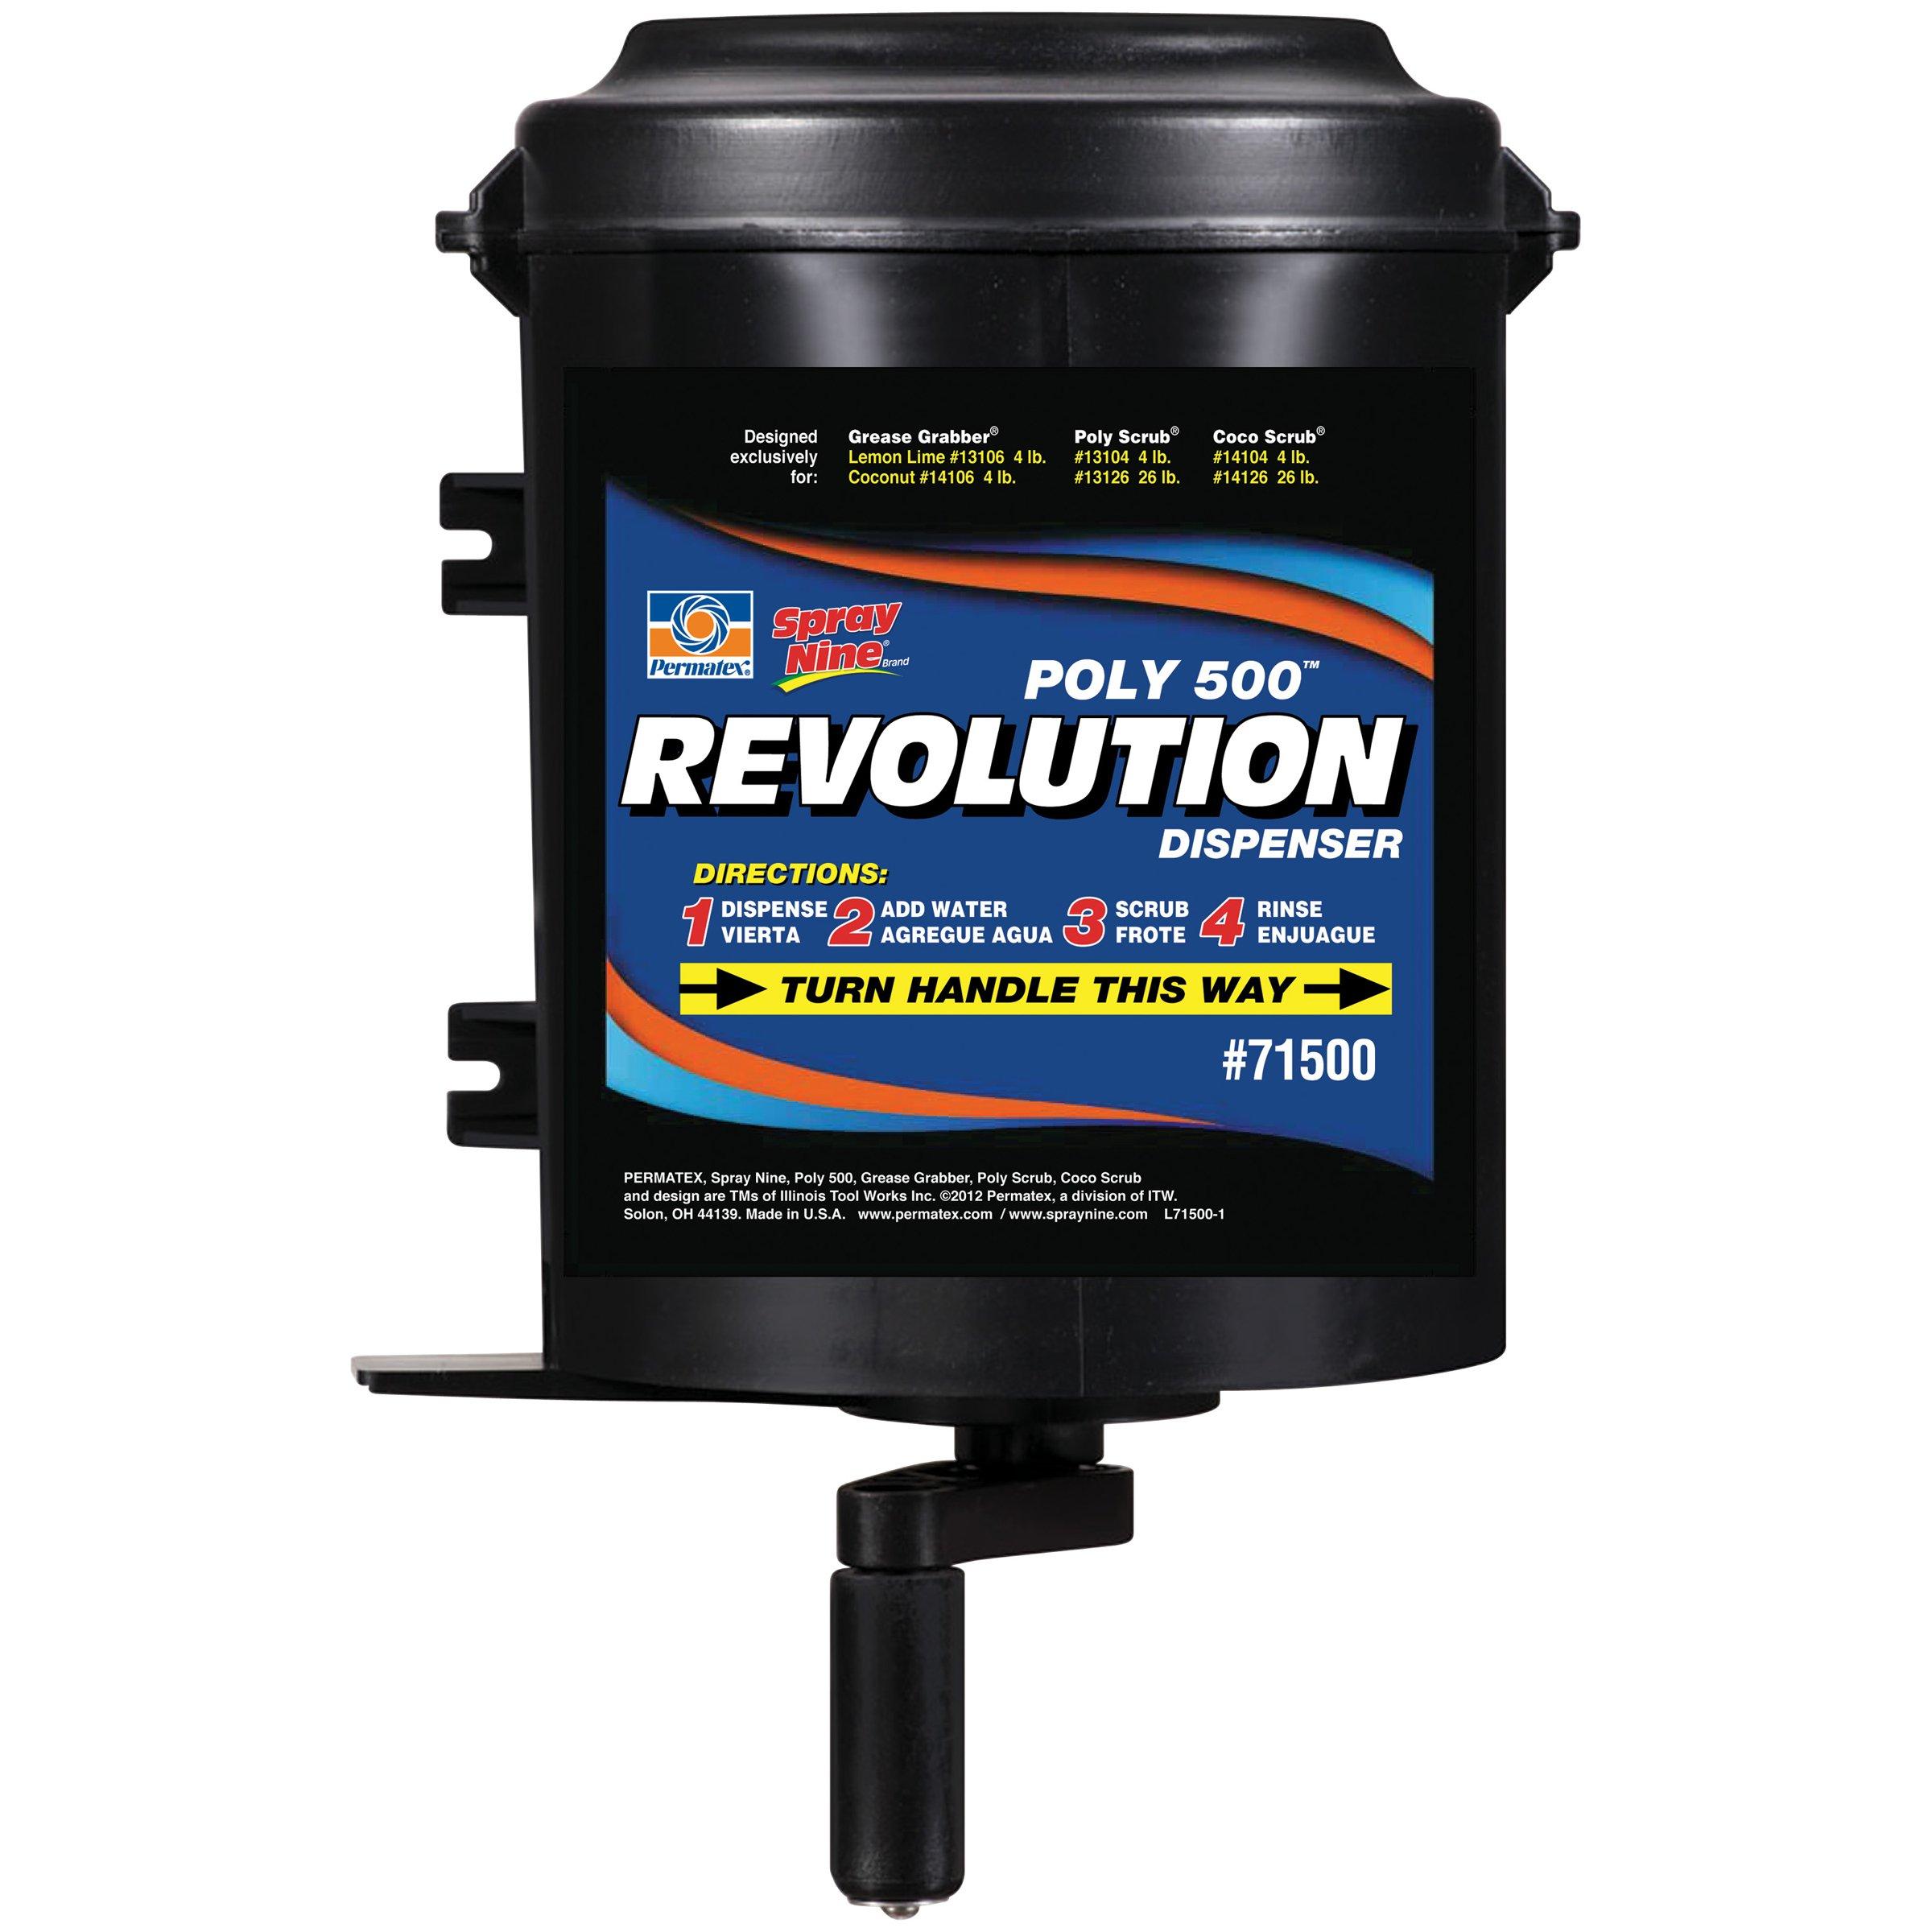 Permatex 71500 Poly 500 Revolution Dispenser